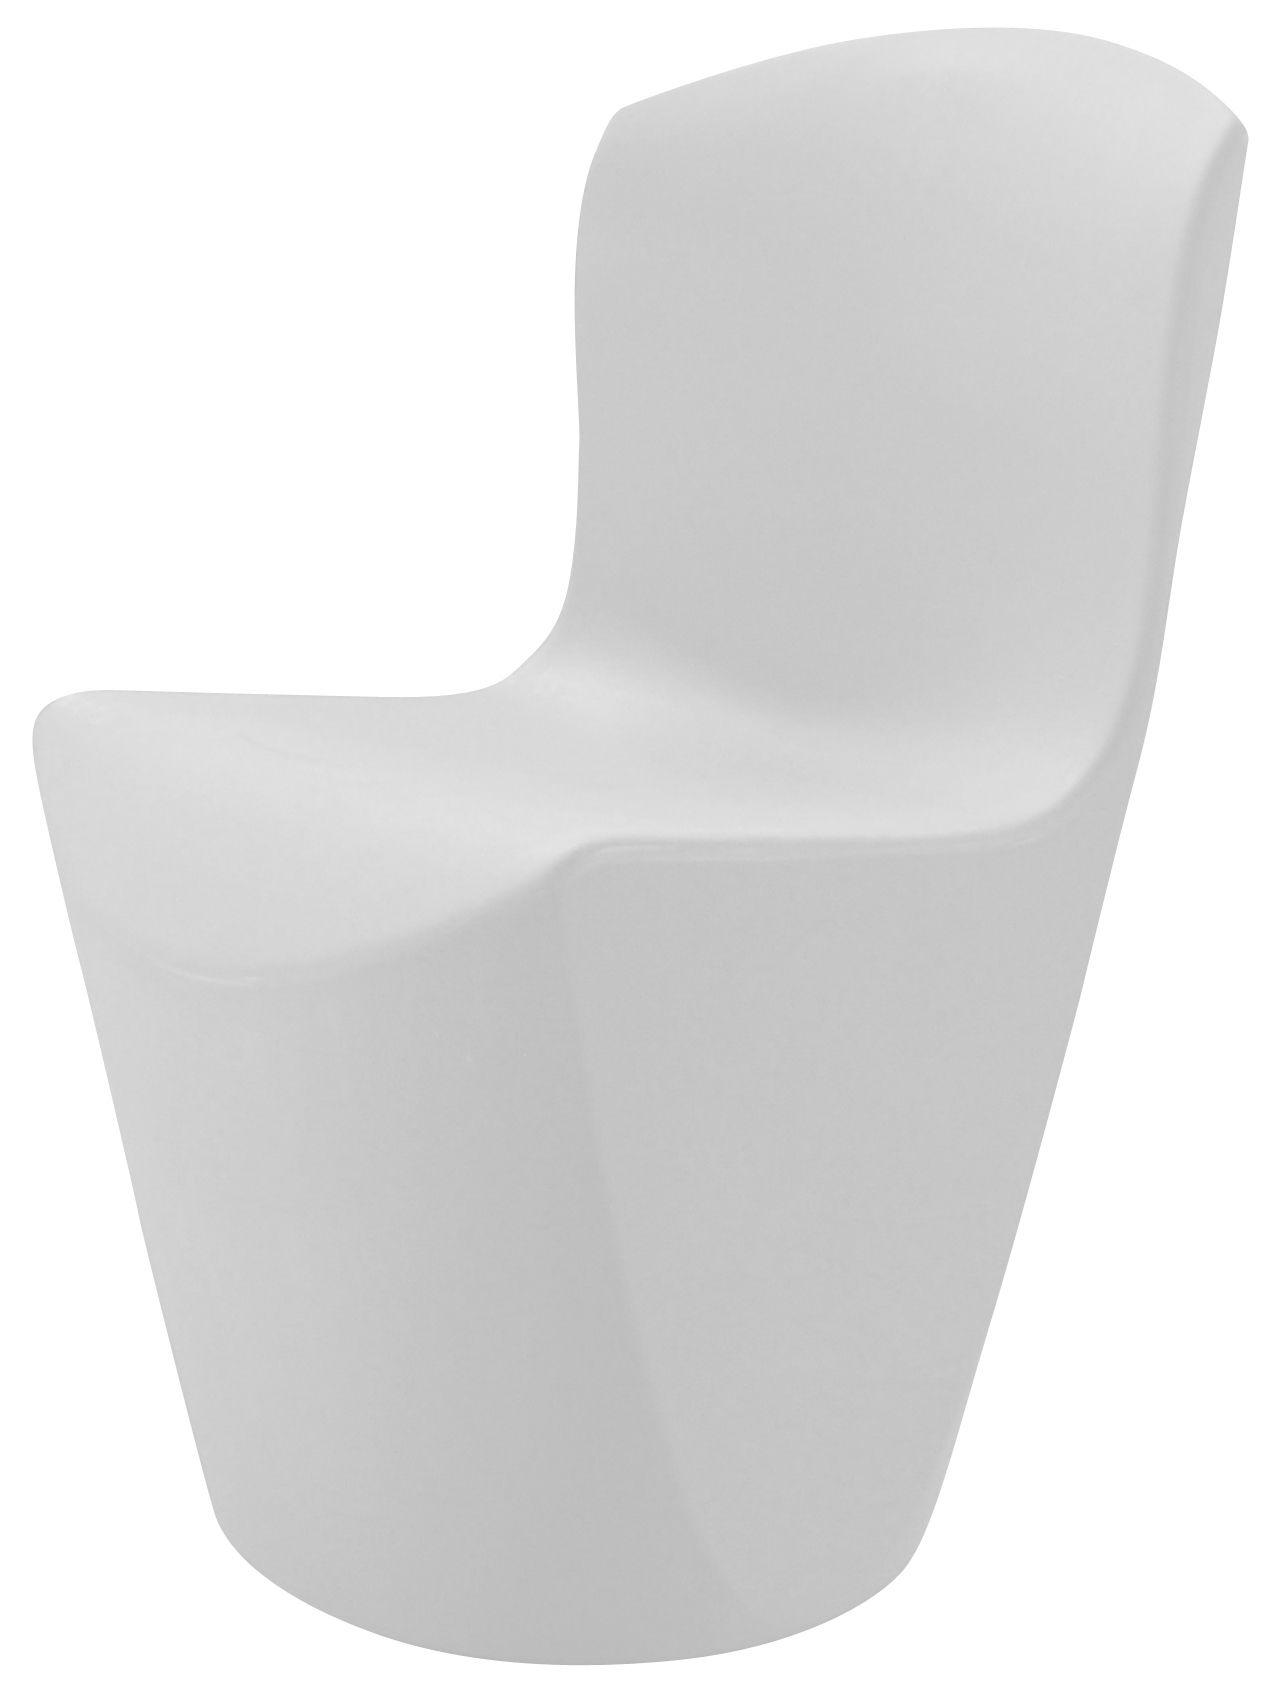 Arredamento - Sedie  - Sedia Zoe di Slide - Bianco - polietilene riciclabile